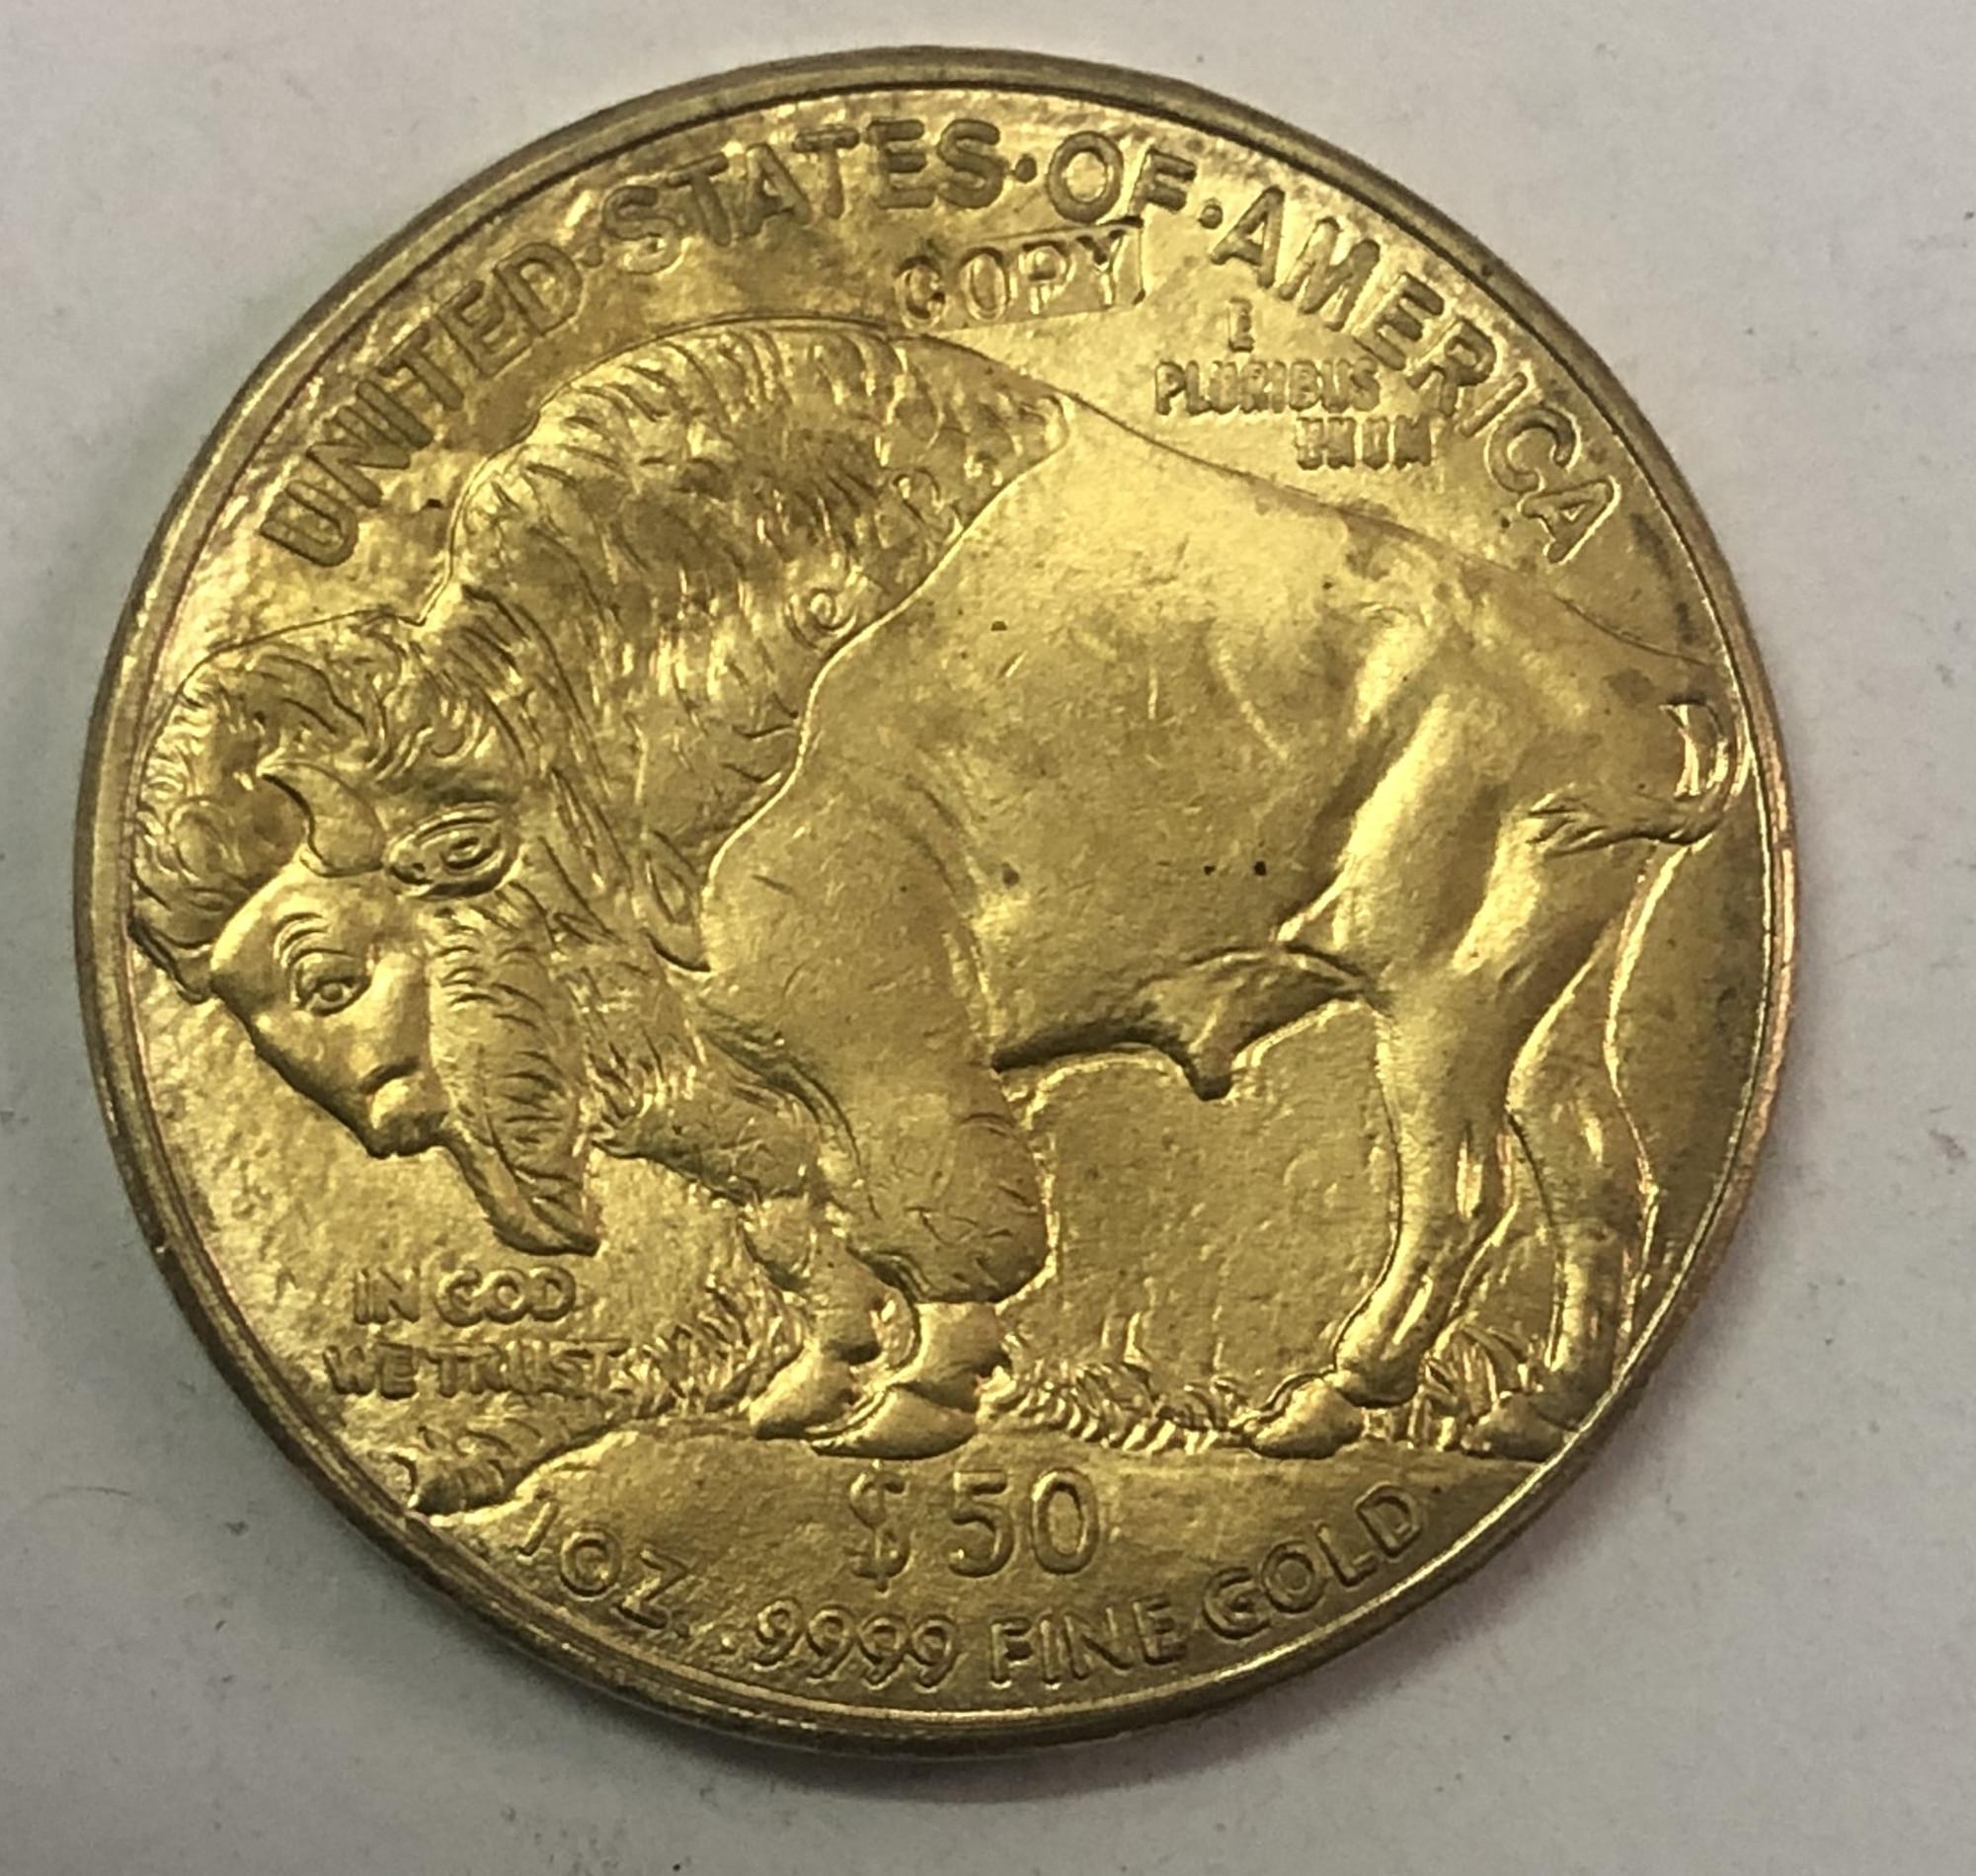 2008 dólares estadounidenses 50 dólares búfalo americano lingote de oro Coinage